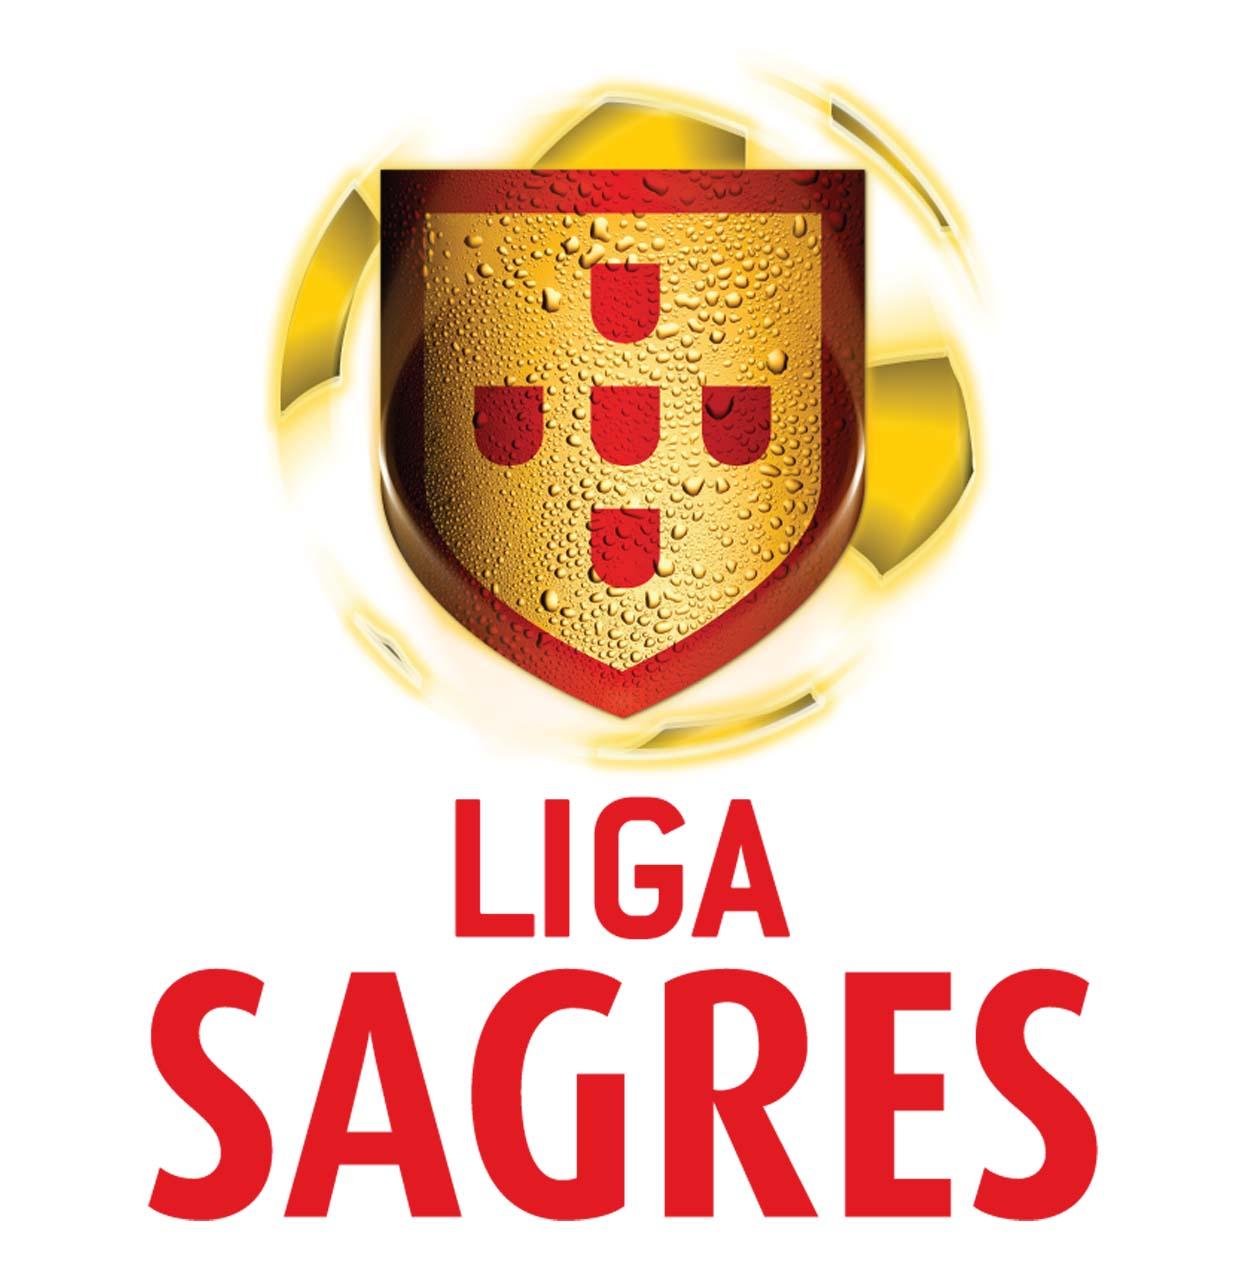 Futebol liga sagres